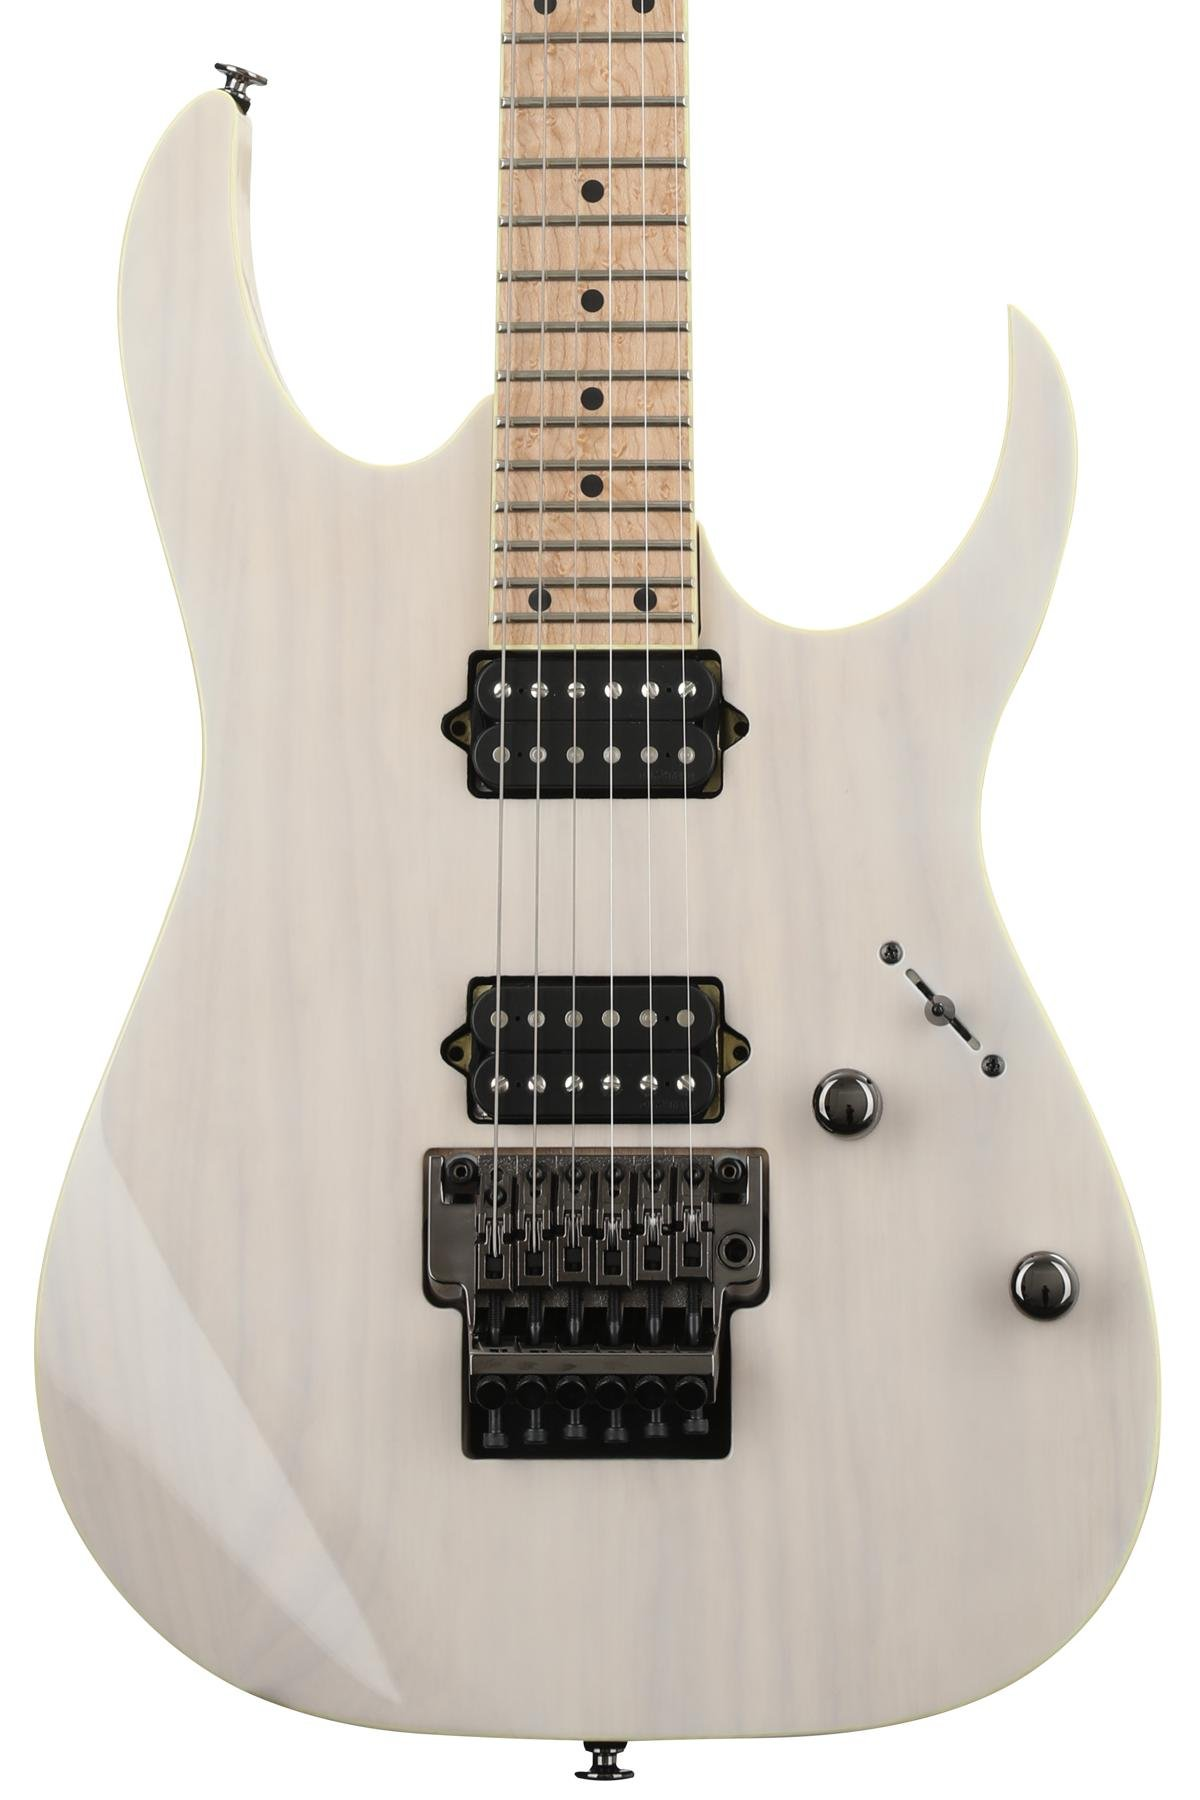 Ibanez Prestige RG652AHM - Antique White Blonde